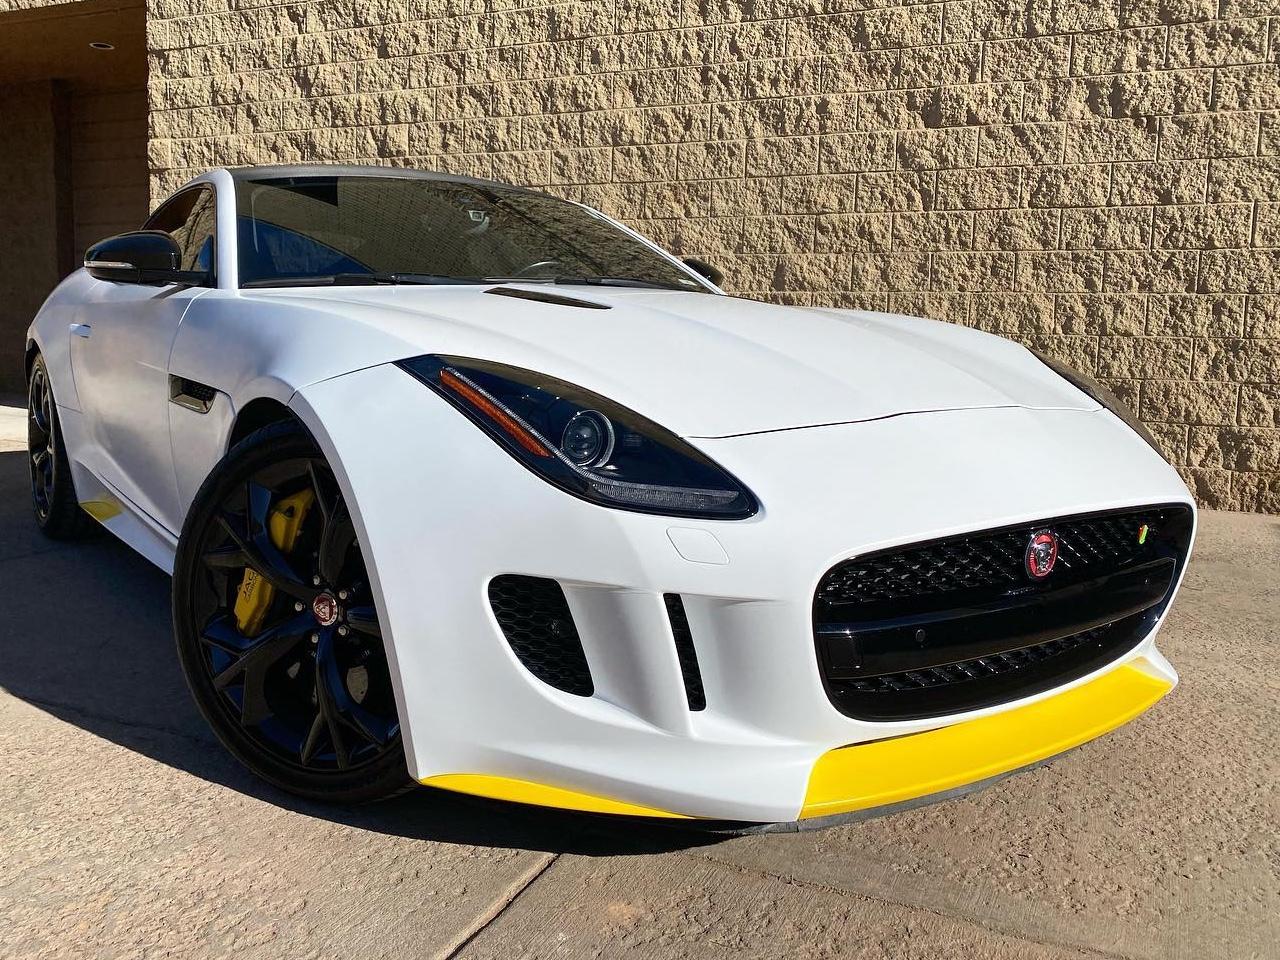 Jaguar F-TYPE vinyl wraps